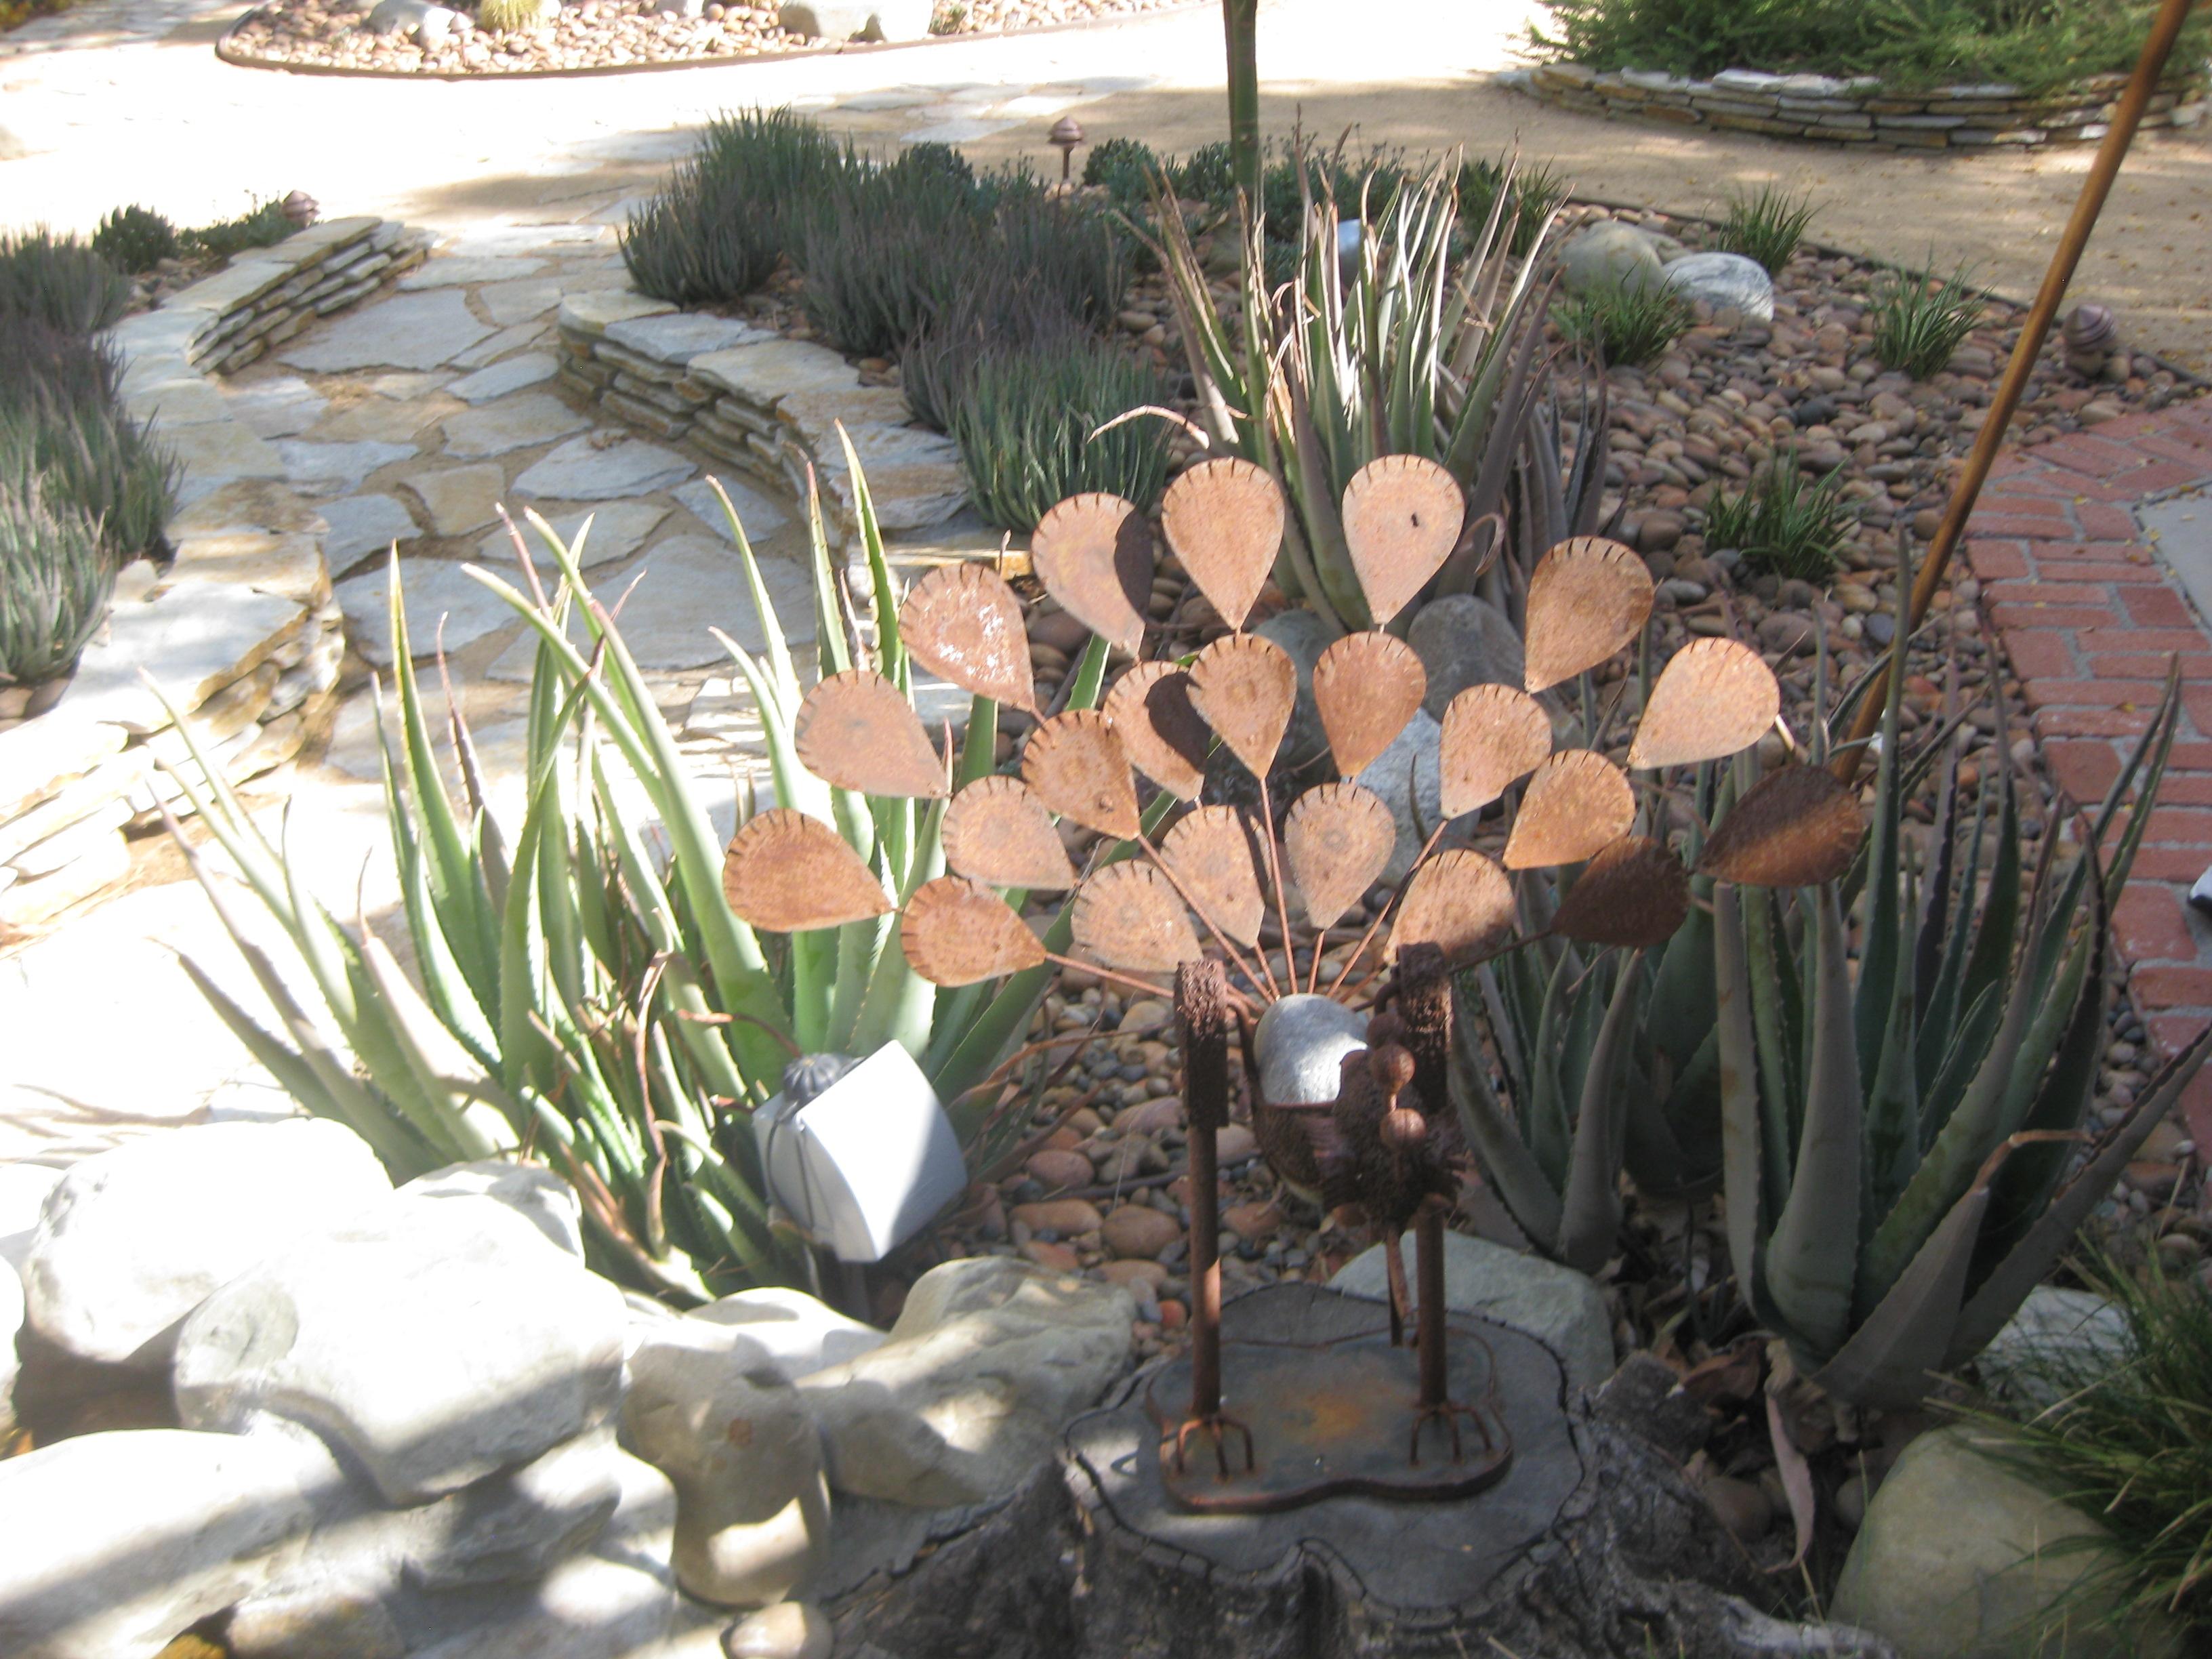 Ornaments for garden - Peacock Ornament In Succulent Garden